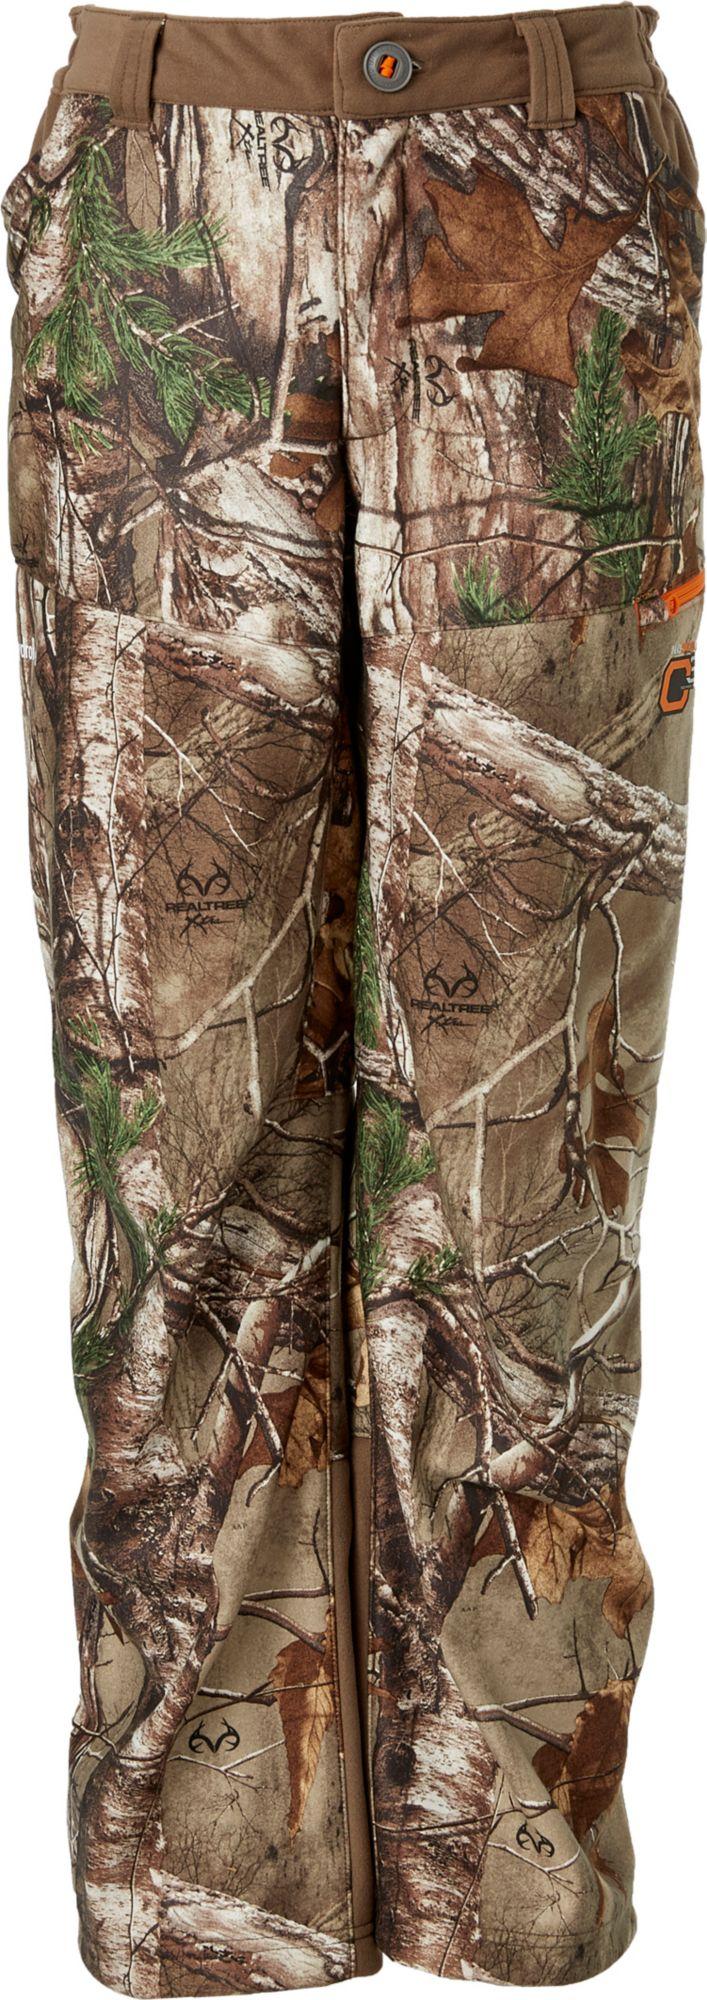 fcc2cb60749bd Field & Stream Youth Every Hunt Softshell Hunting Pants, Kids Unisex, Size:  XL